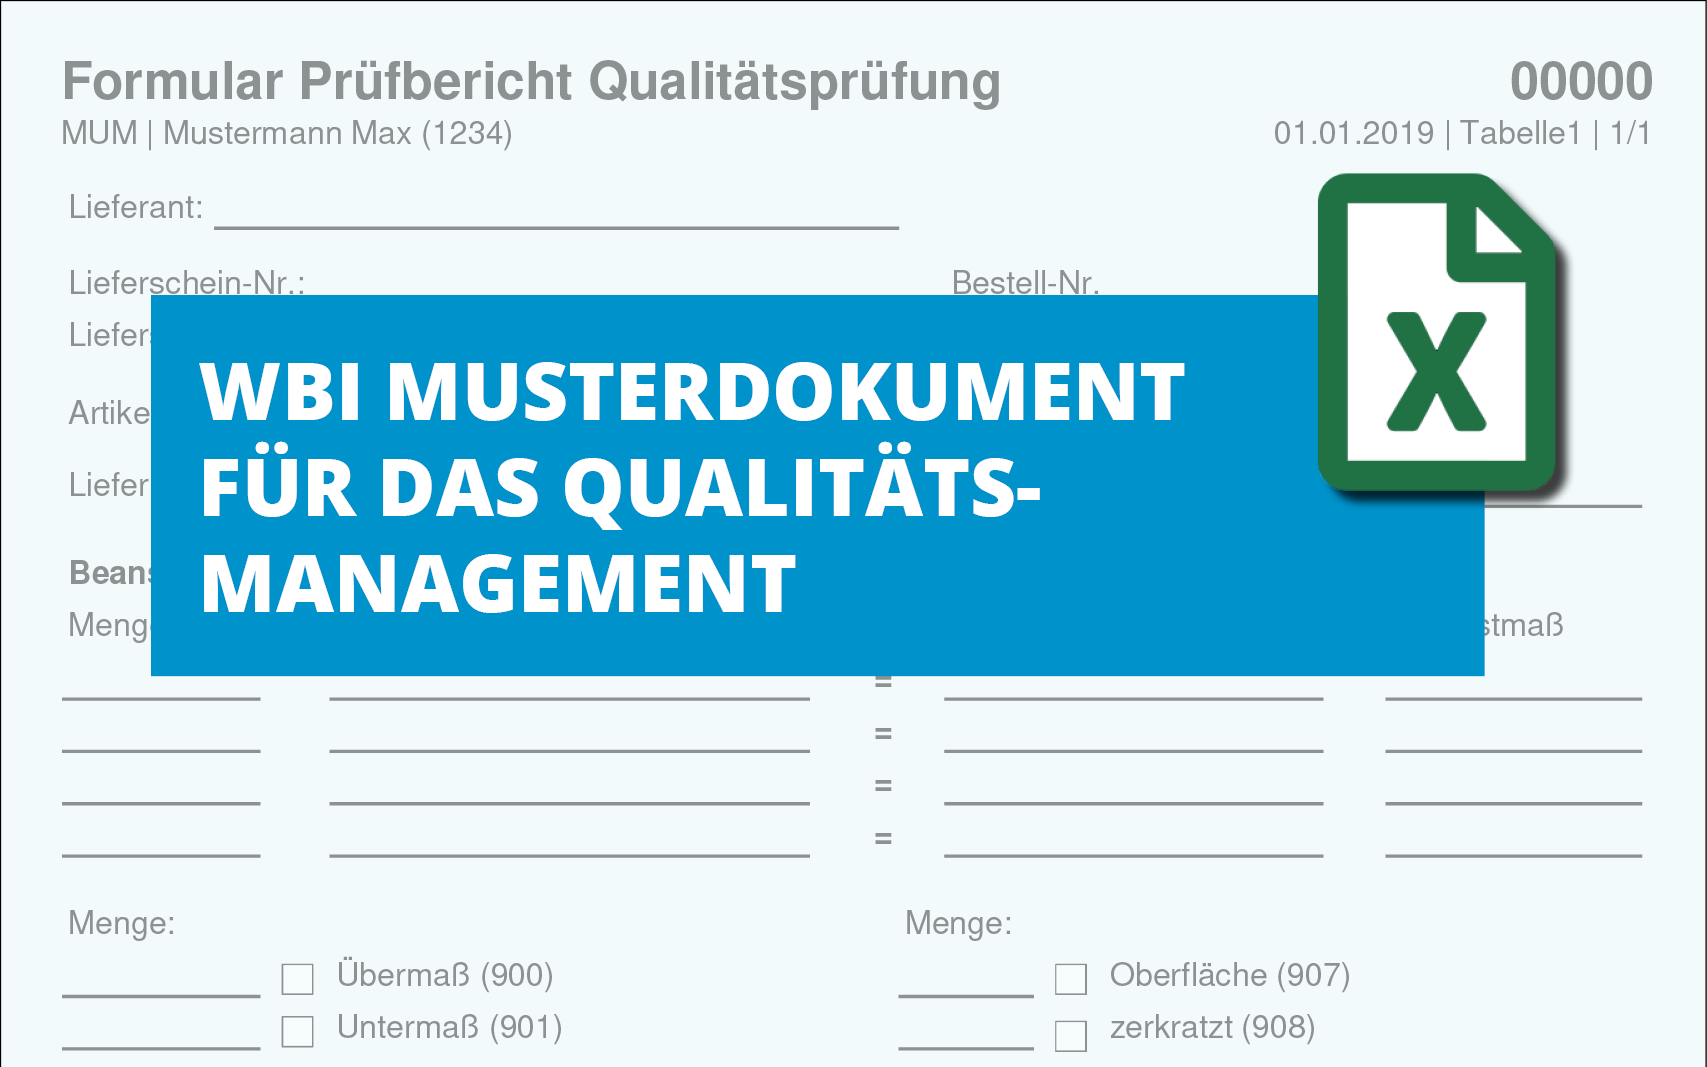 formular-pruefbericht-qualitaetspruefung